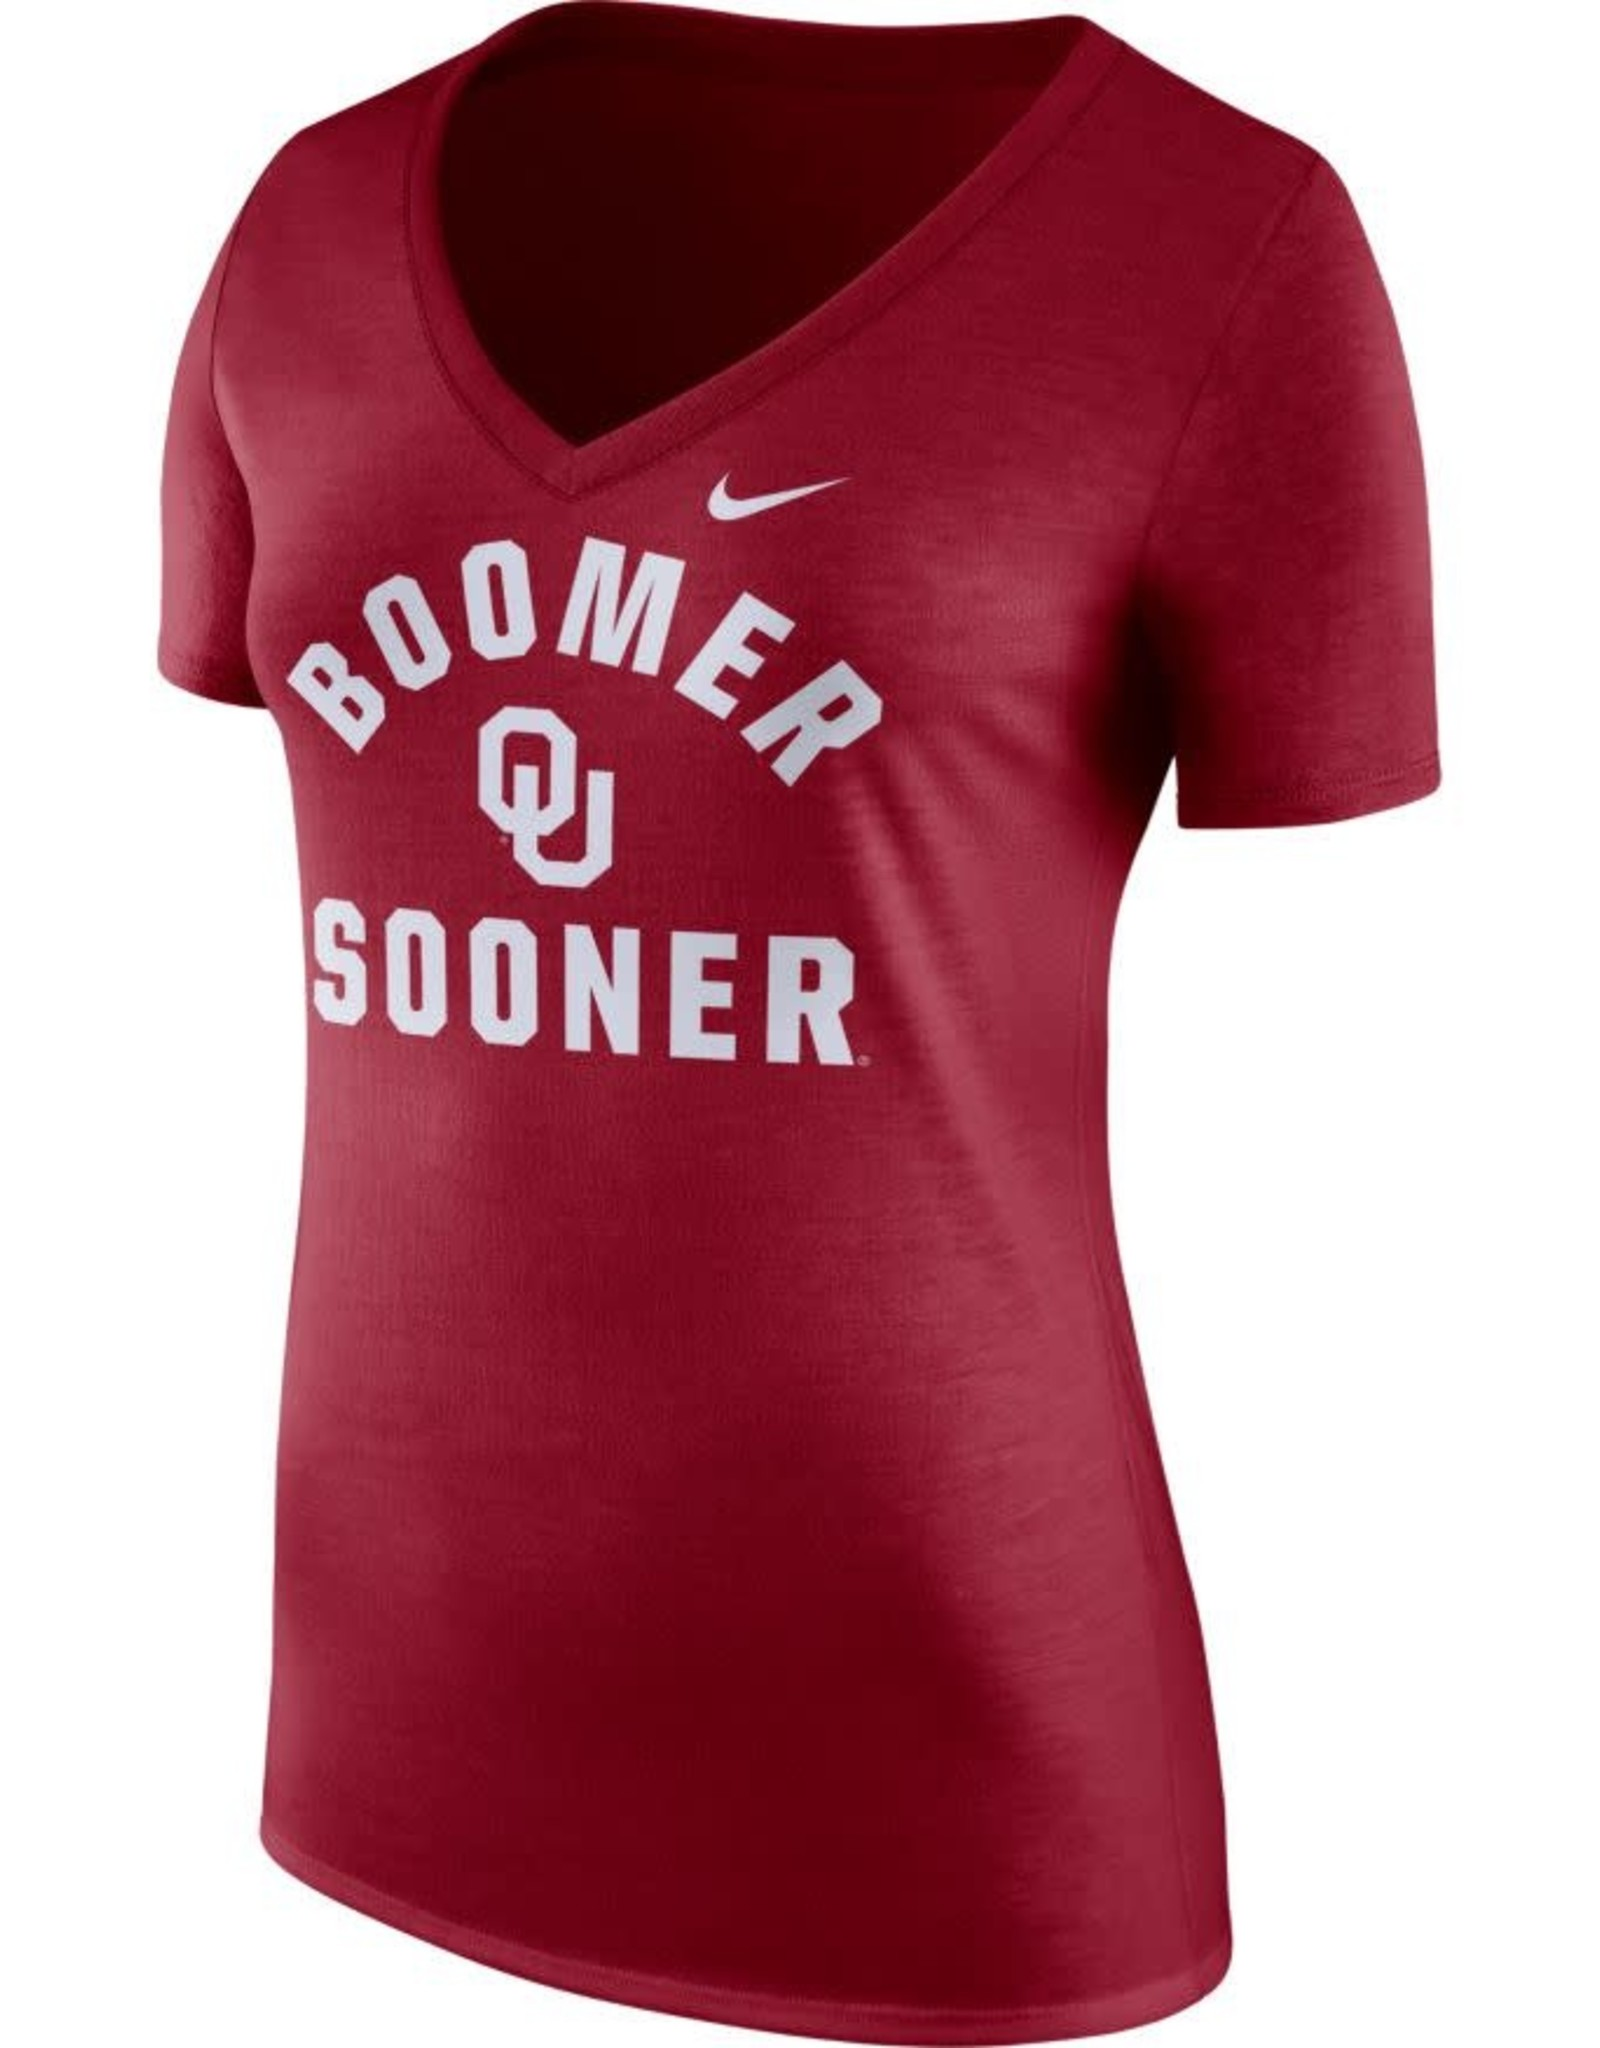 Nike Women's Nike Tri-V Mantra Tee Crimson Boomer Sooner